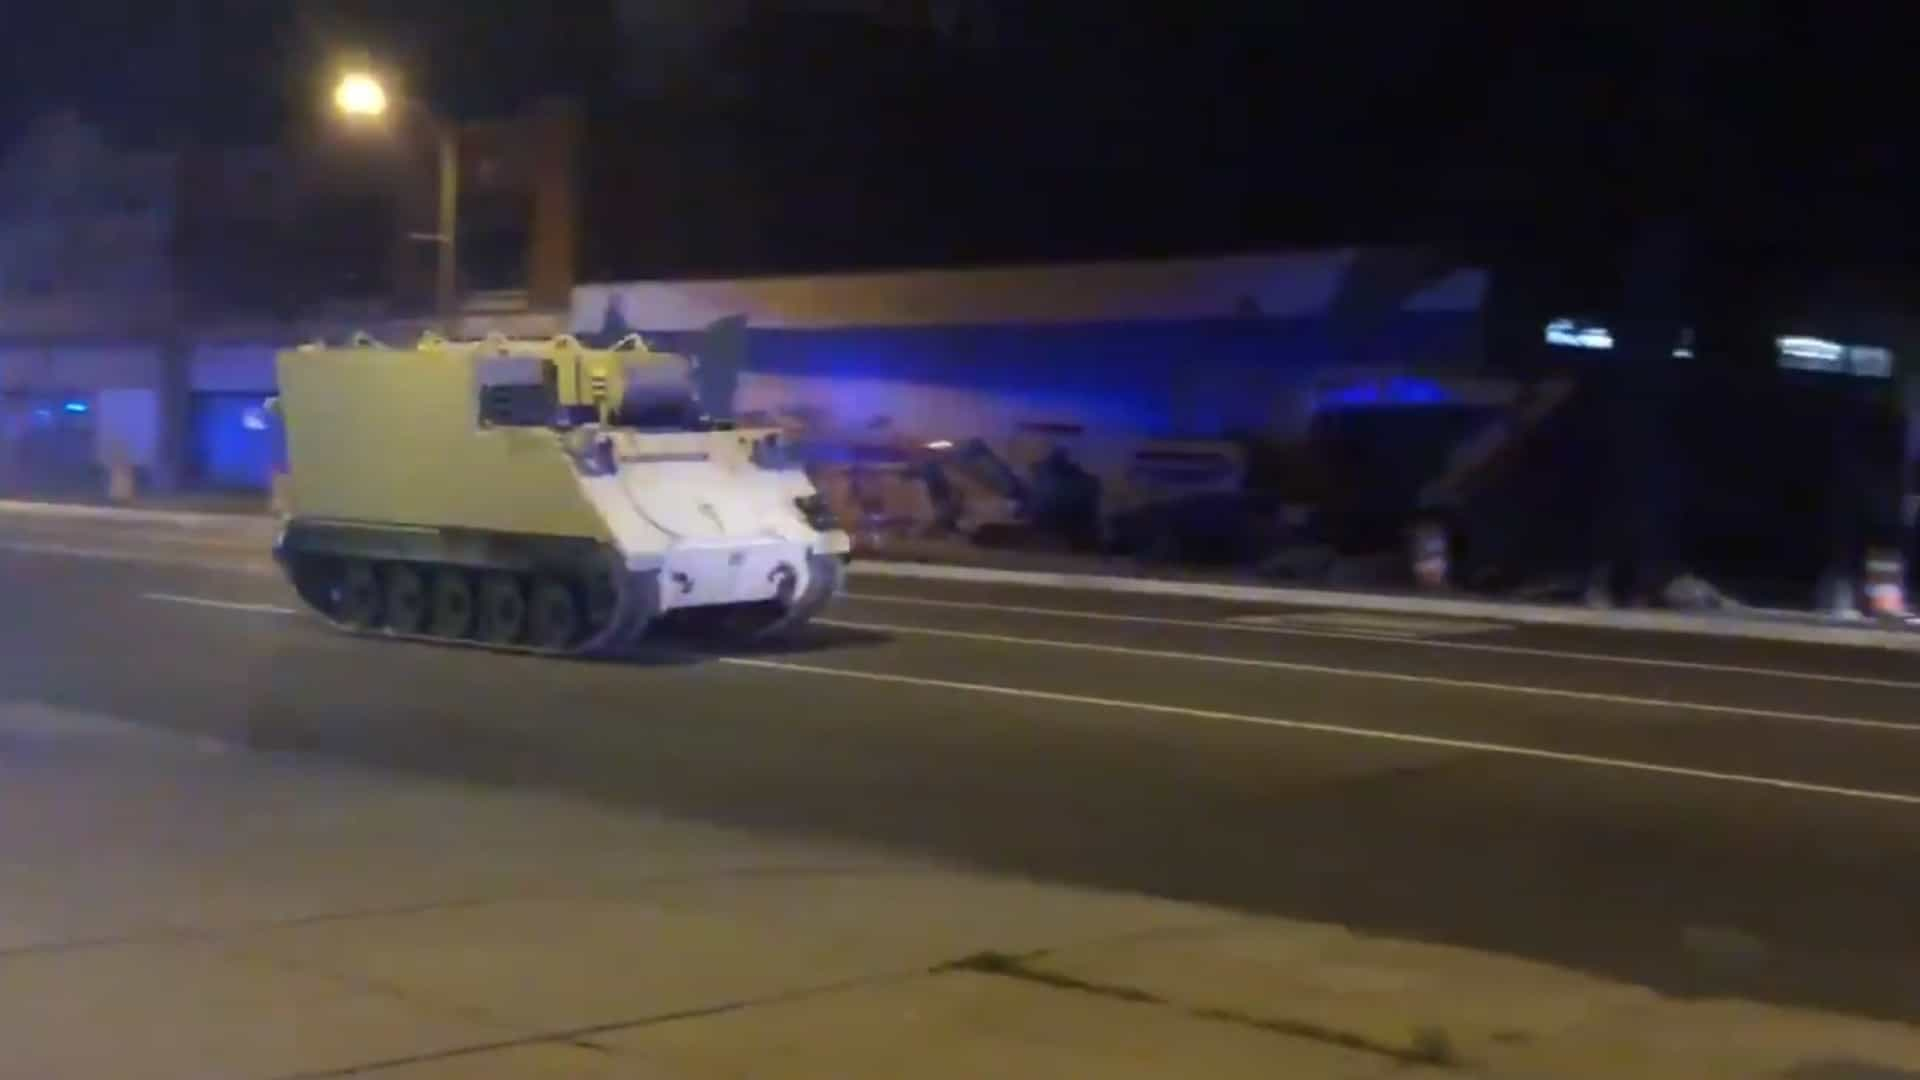 Soldado rouba veículo blindado e acaba perseguido pela polícia